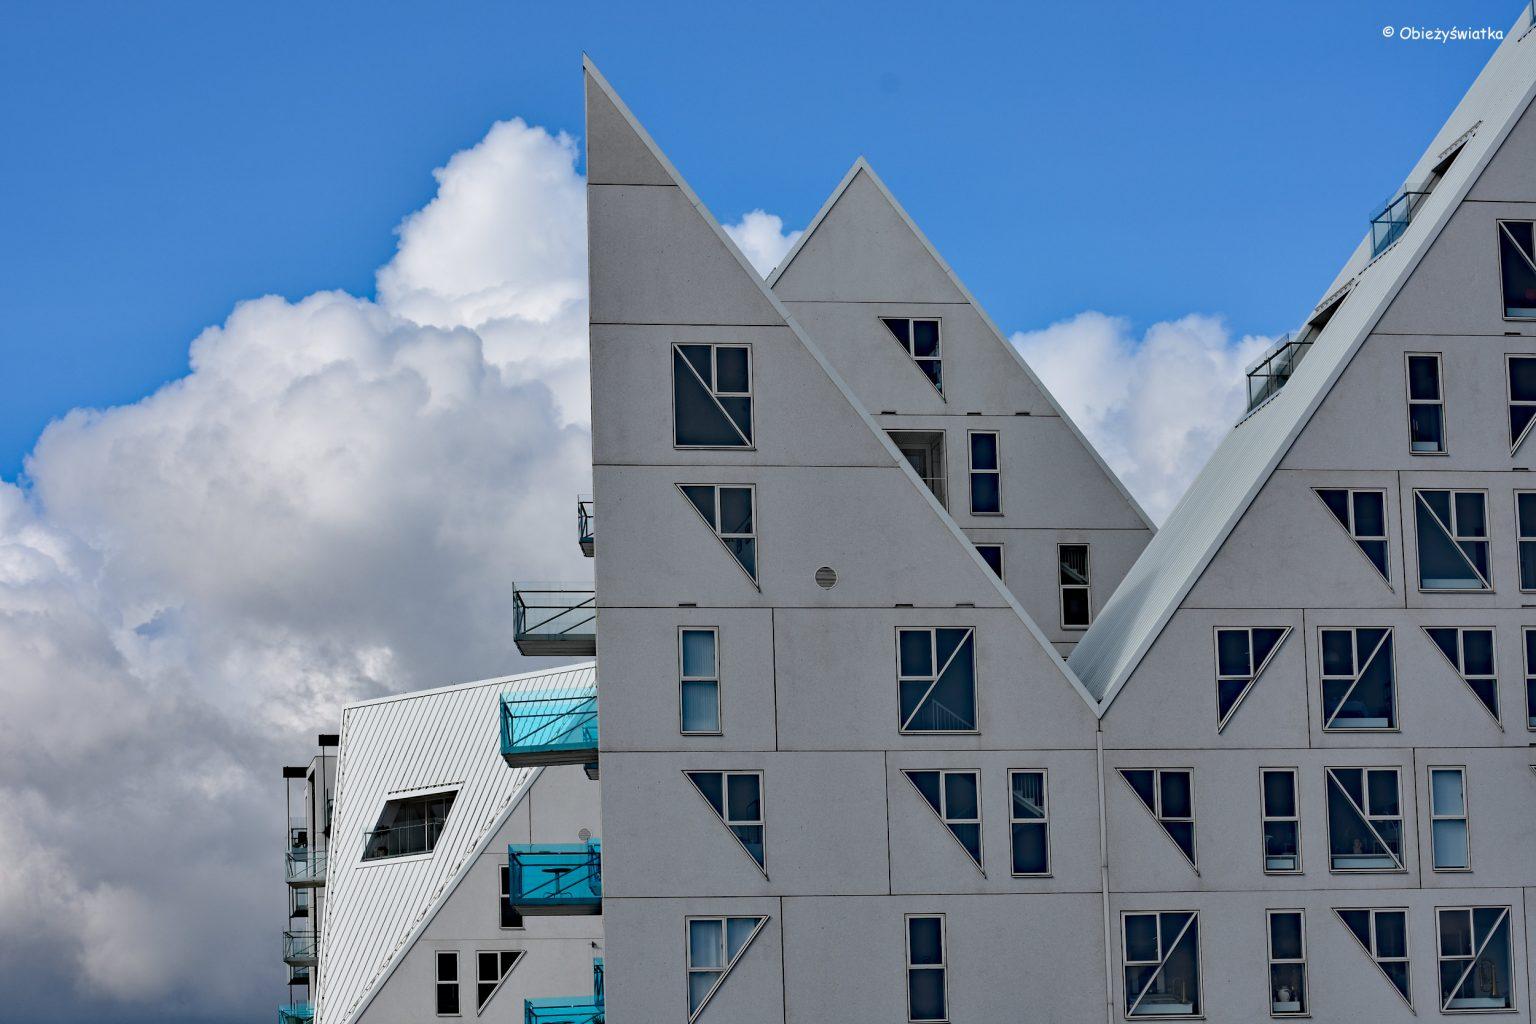 Łamana bryła Isbjerget, Aarhus, Dania